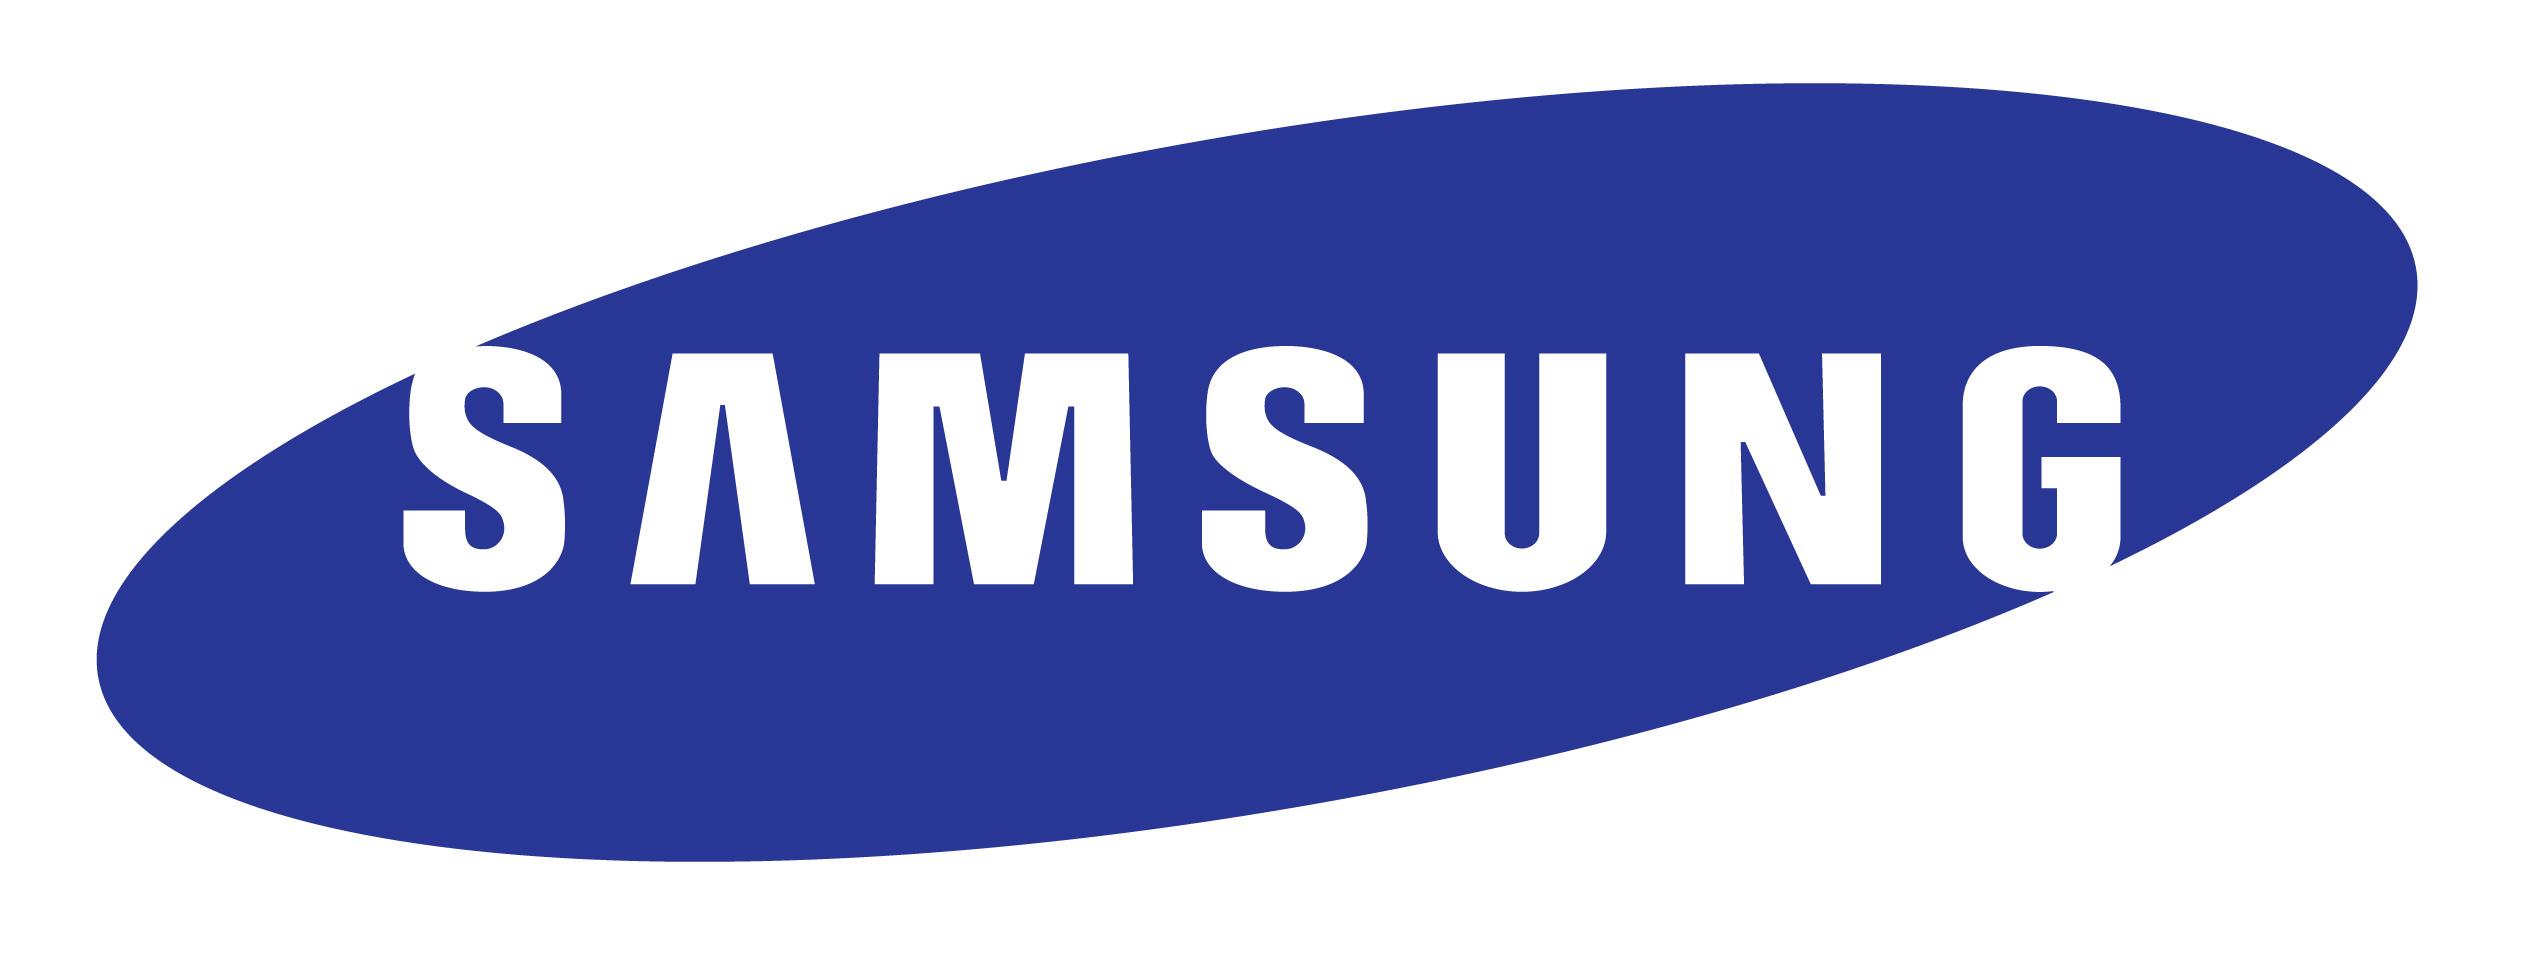 Samsung jpeg